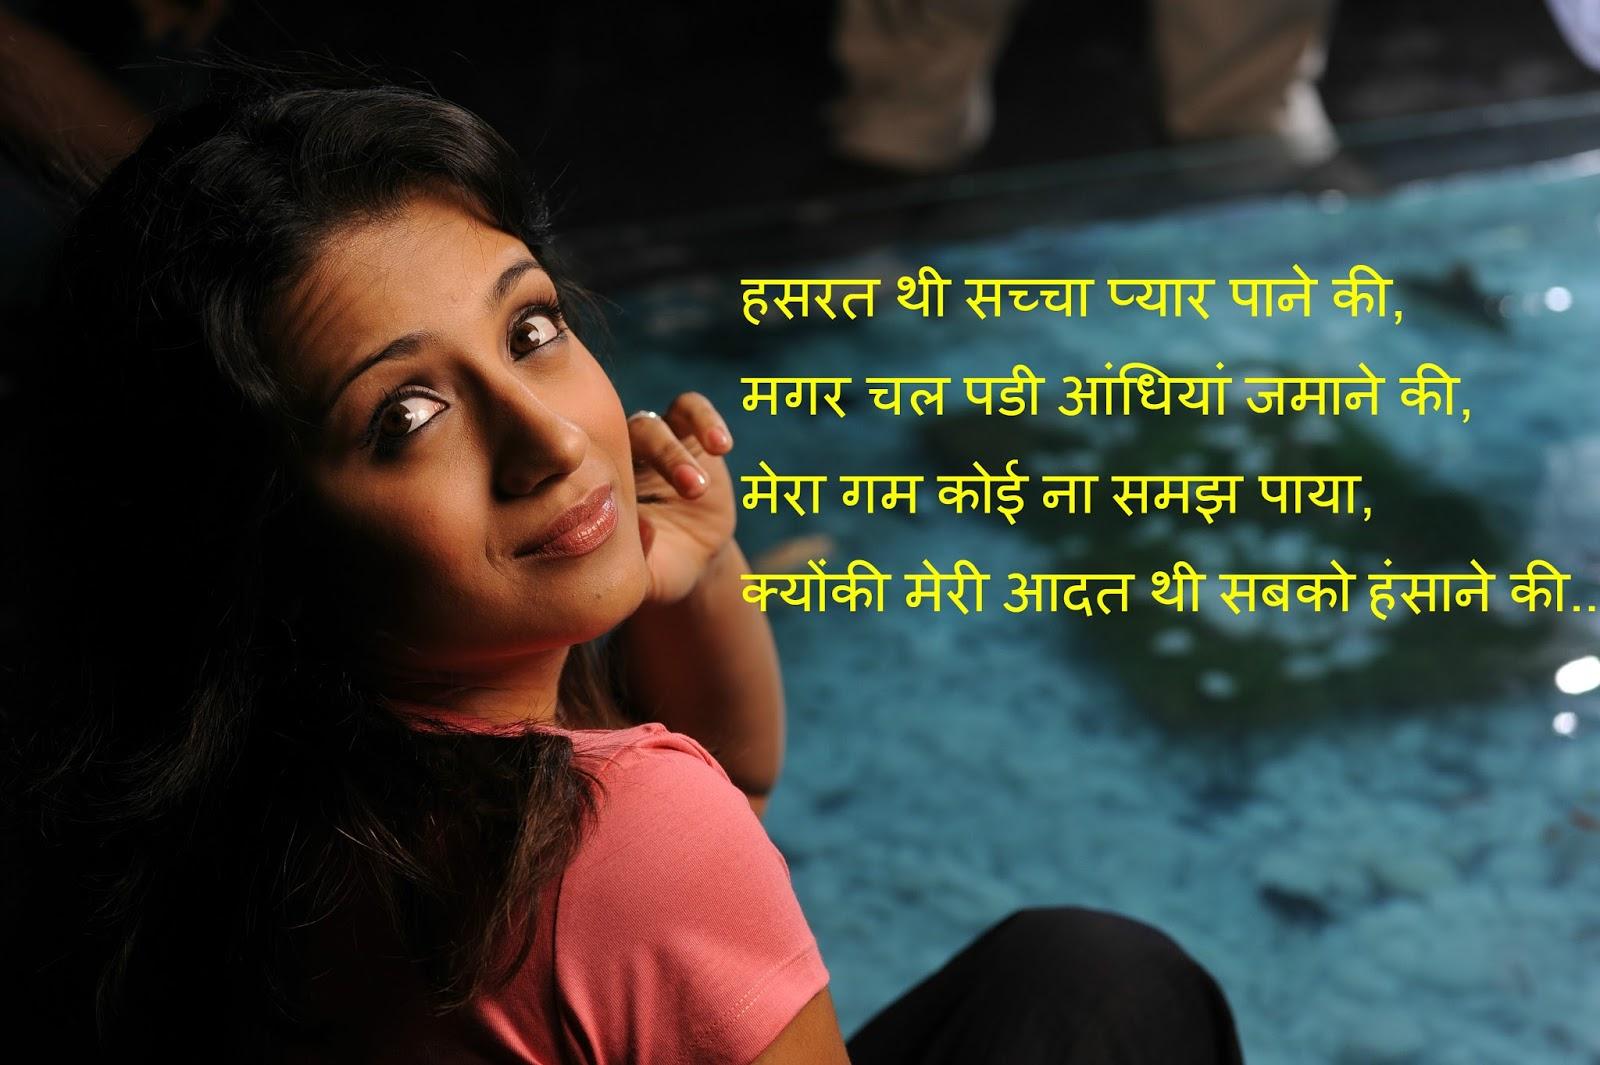 Shayari Beautiful Girl